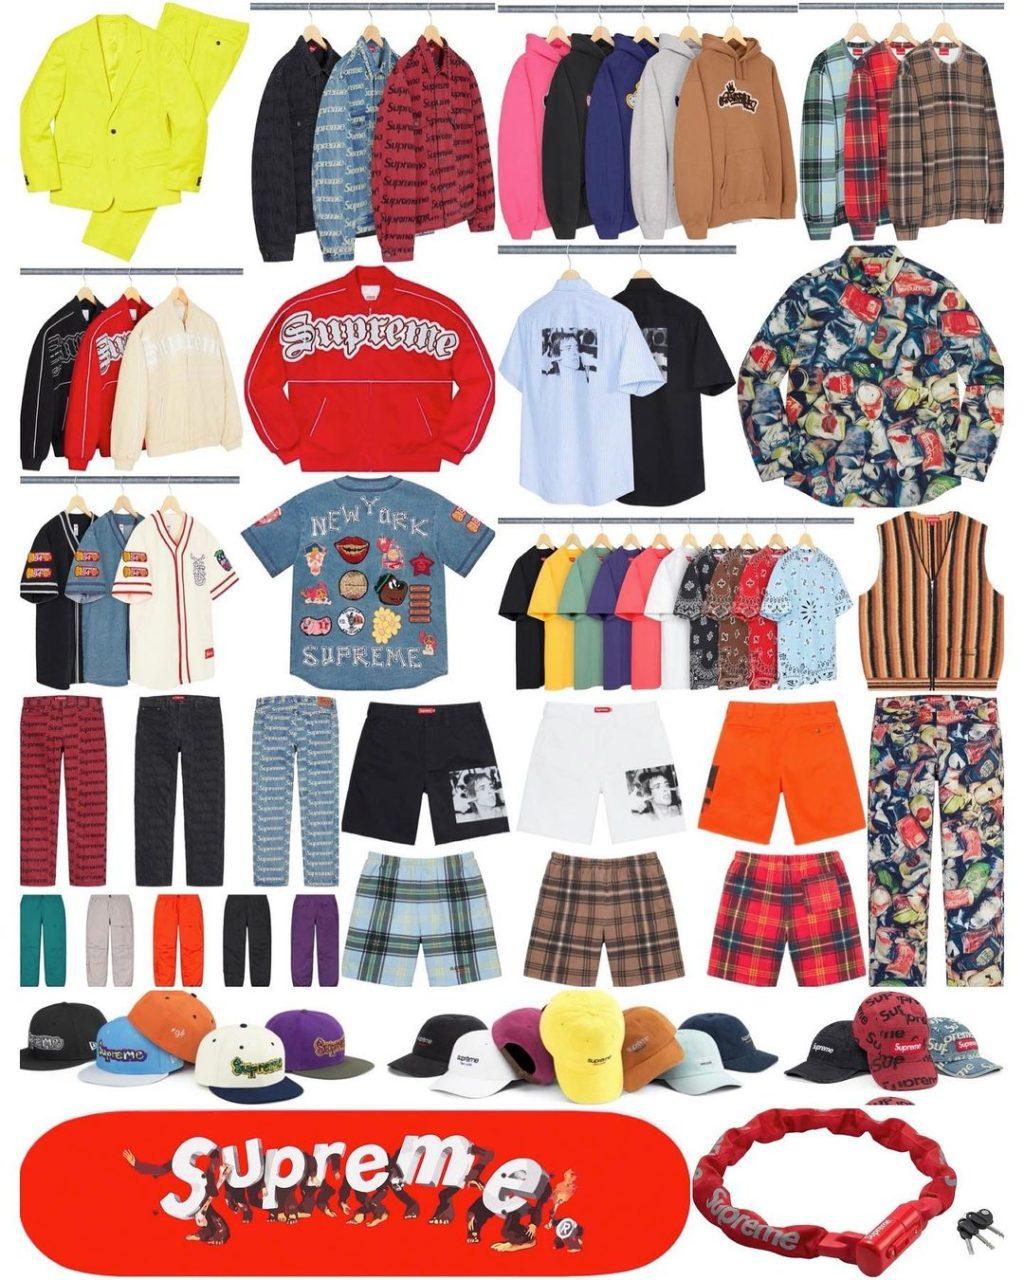 supreme-online-store-20210501-week10-release-items-list